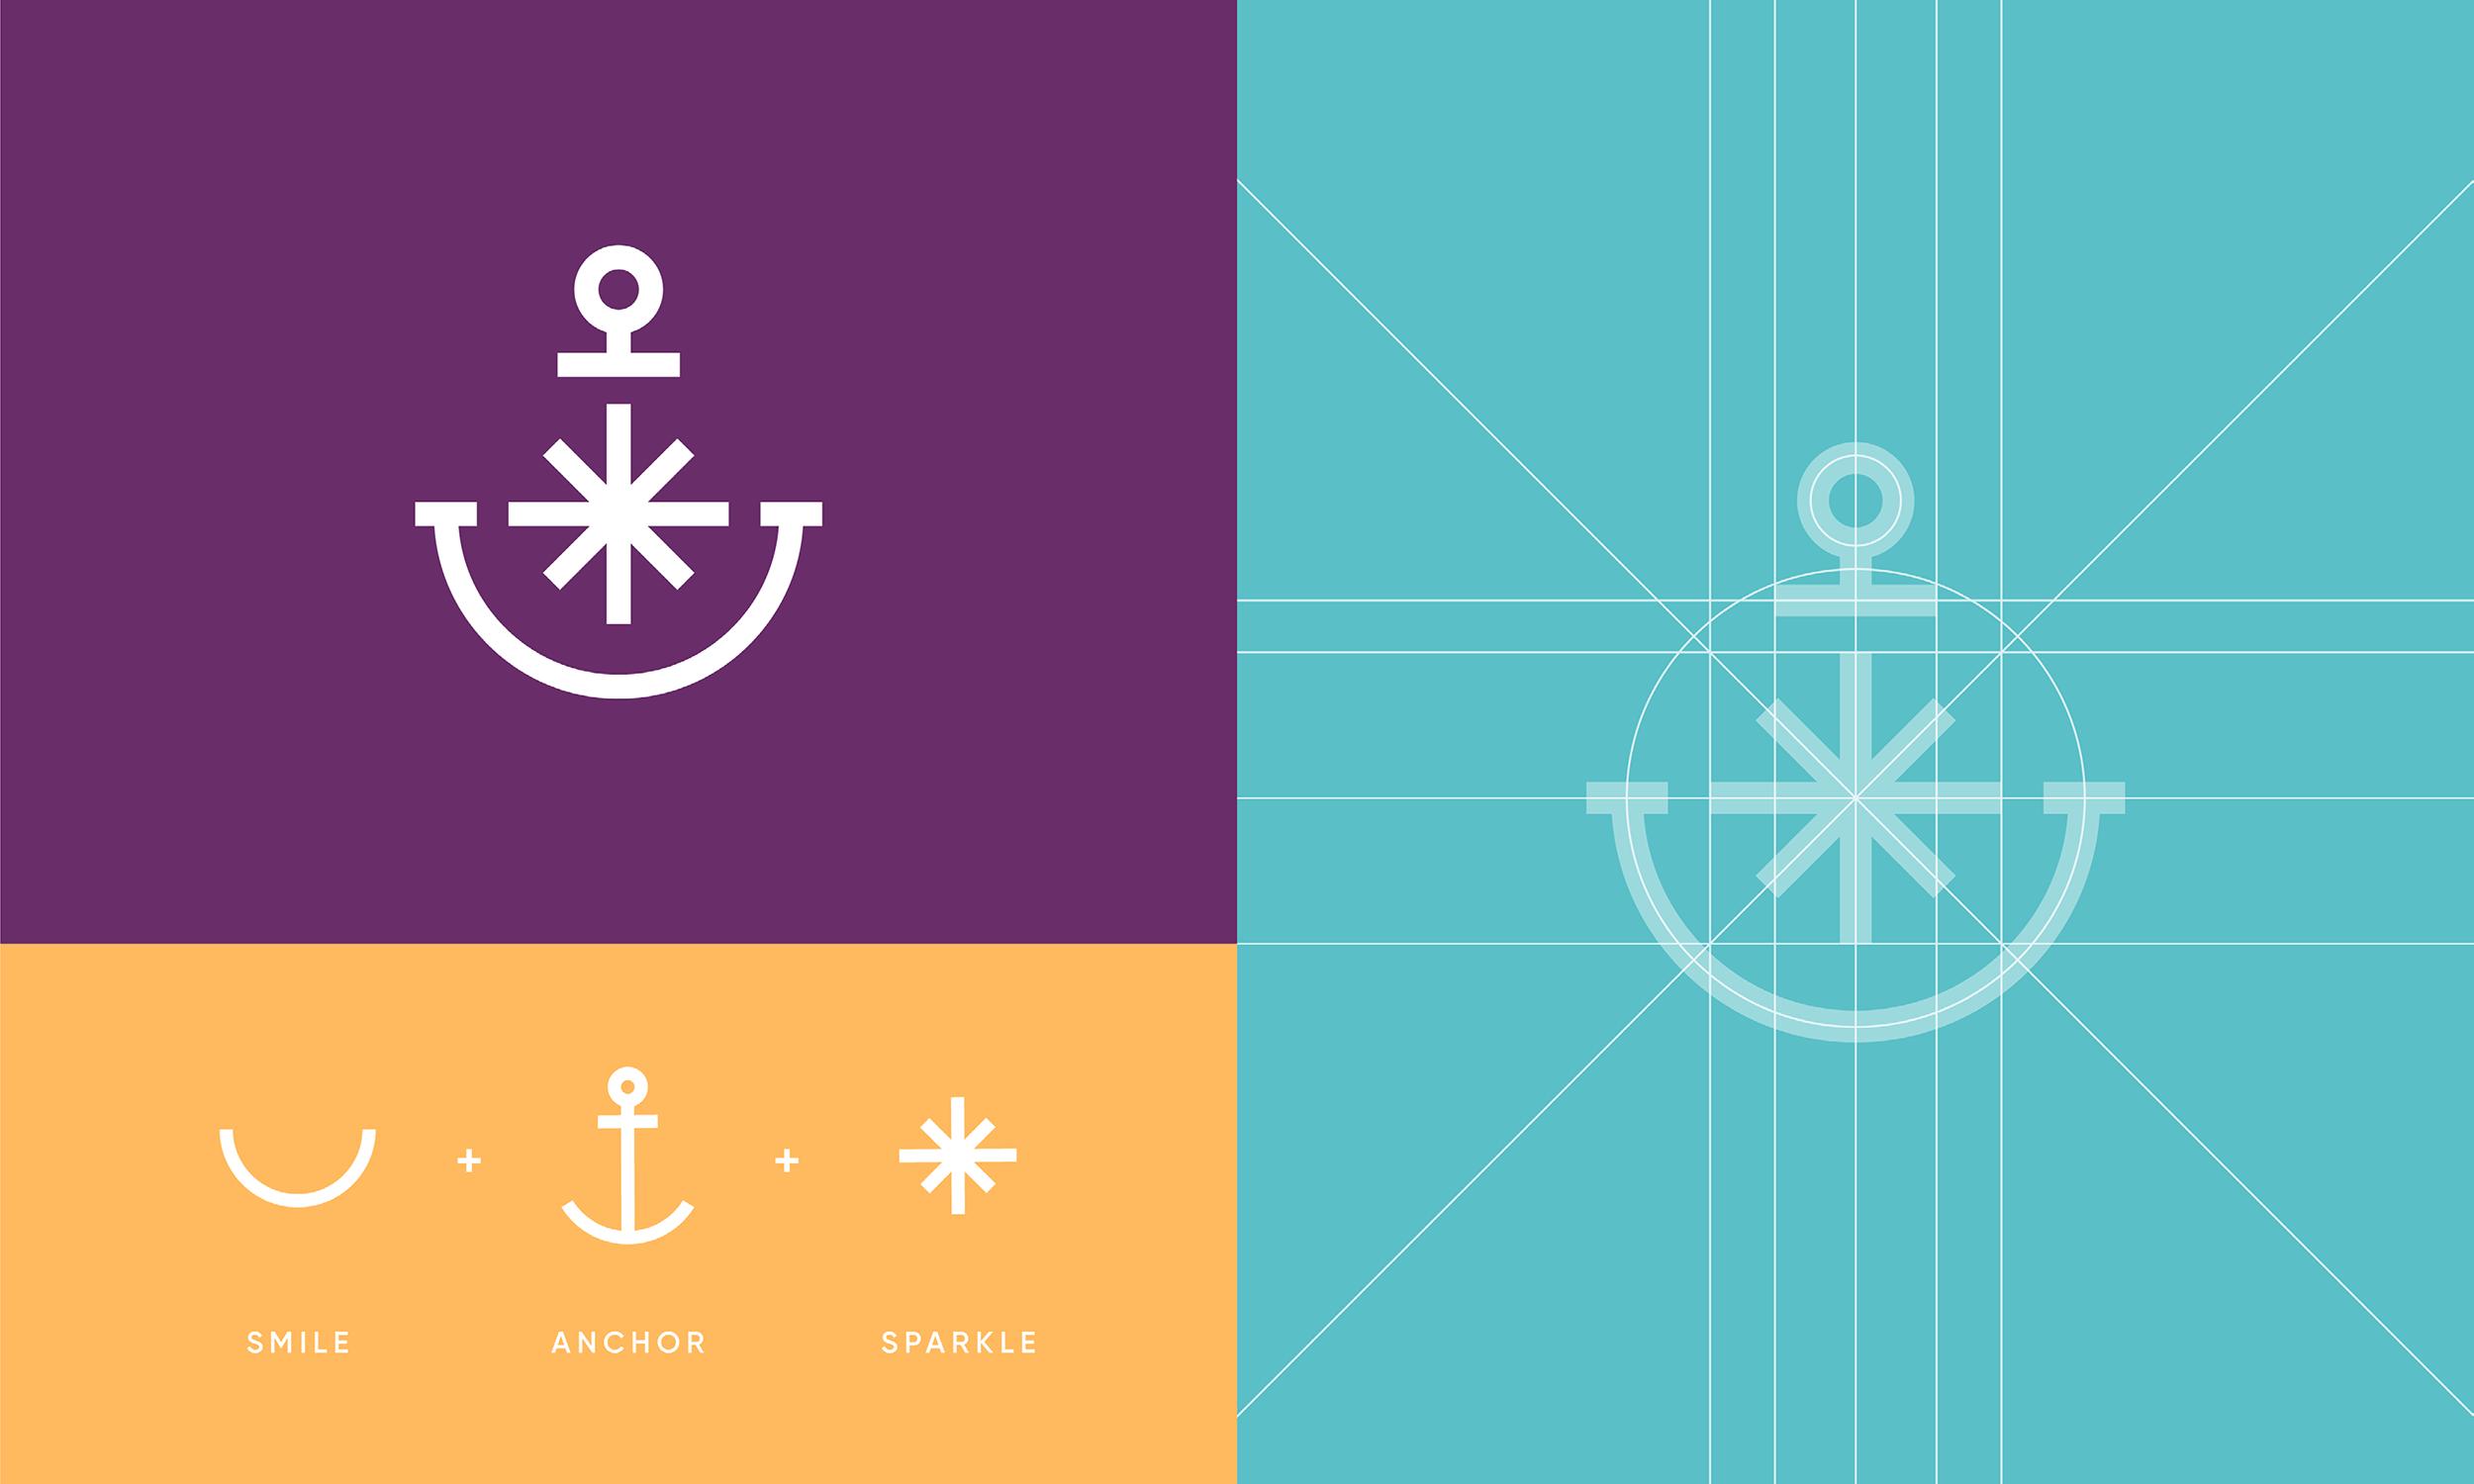 Capistrano-Childrens-Dentistry-Logo-Design-Freelance-Graphic-Designer-Margate-Kent-Presentation-Pediatric-Dental-Logo-Grid